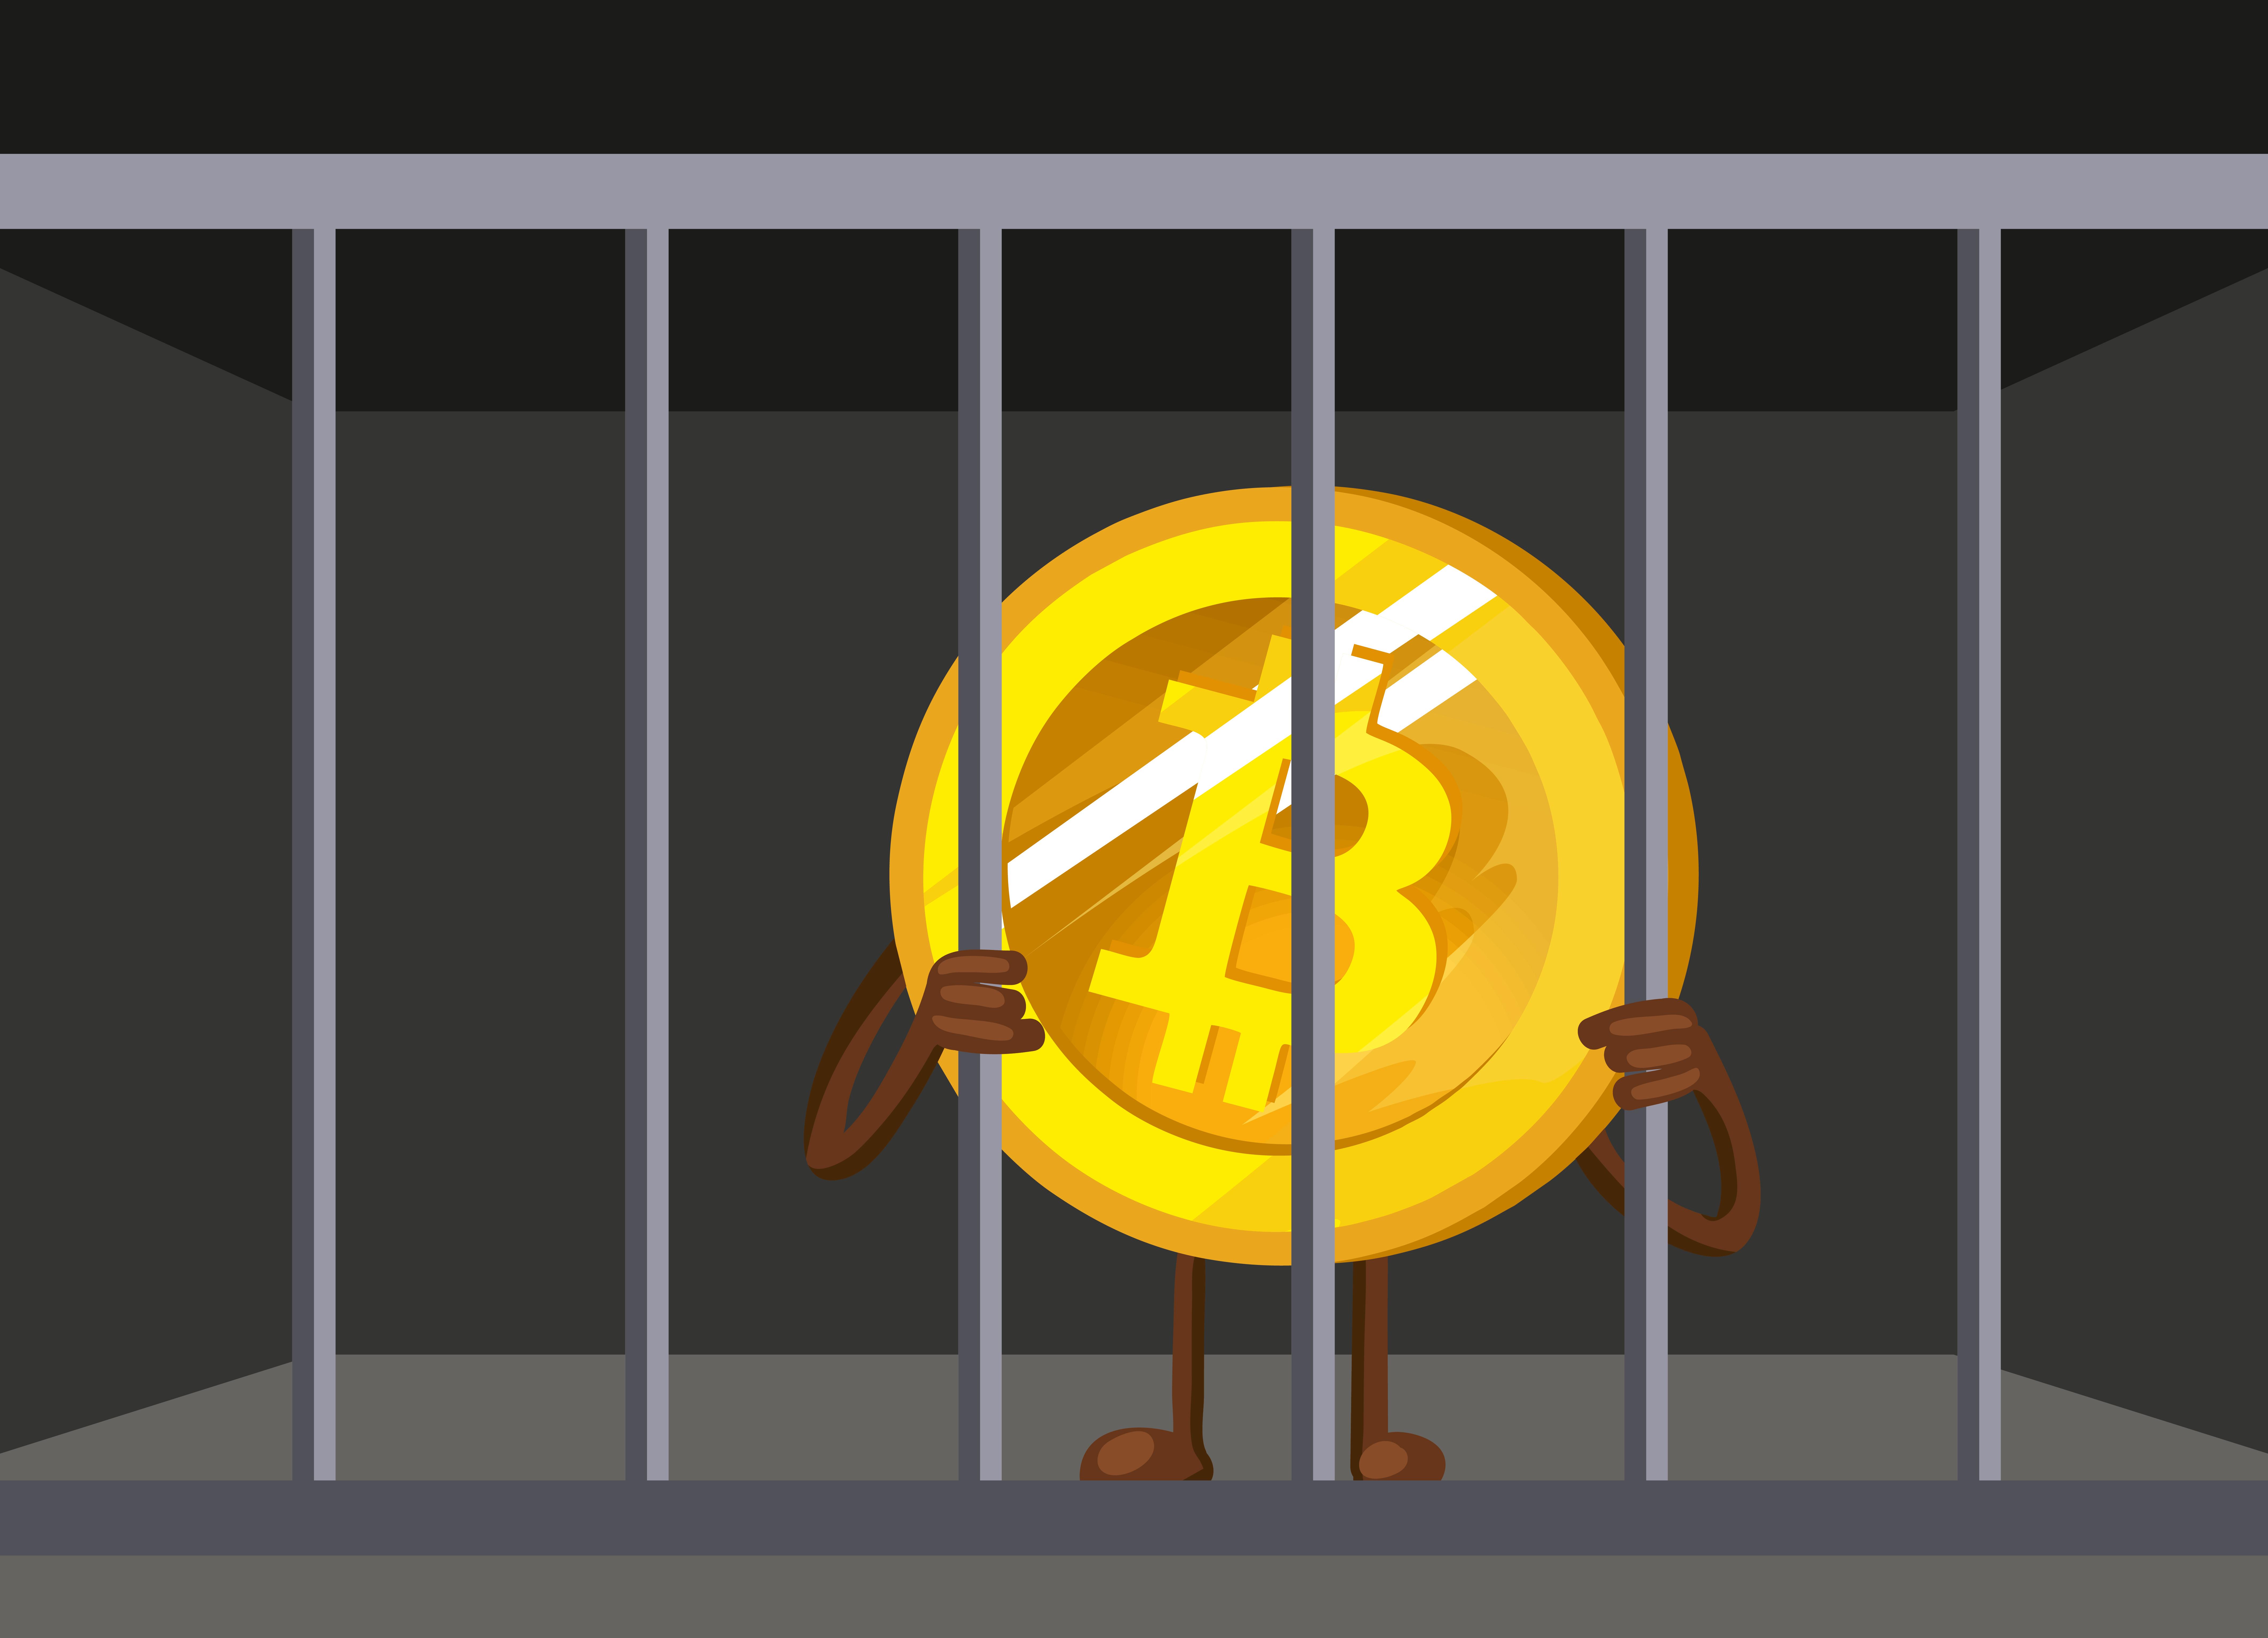 blogcertified-Should-Regulators-Ban-Crypto